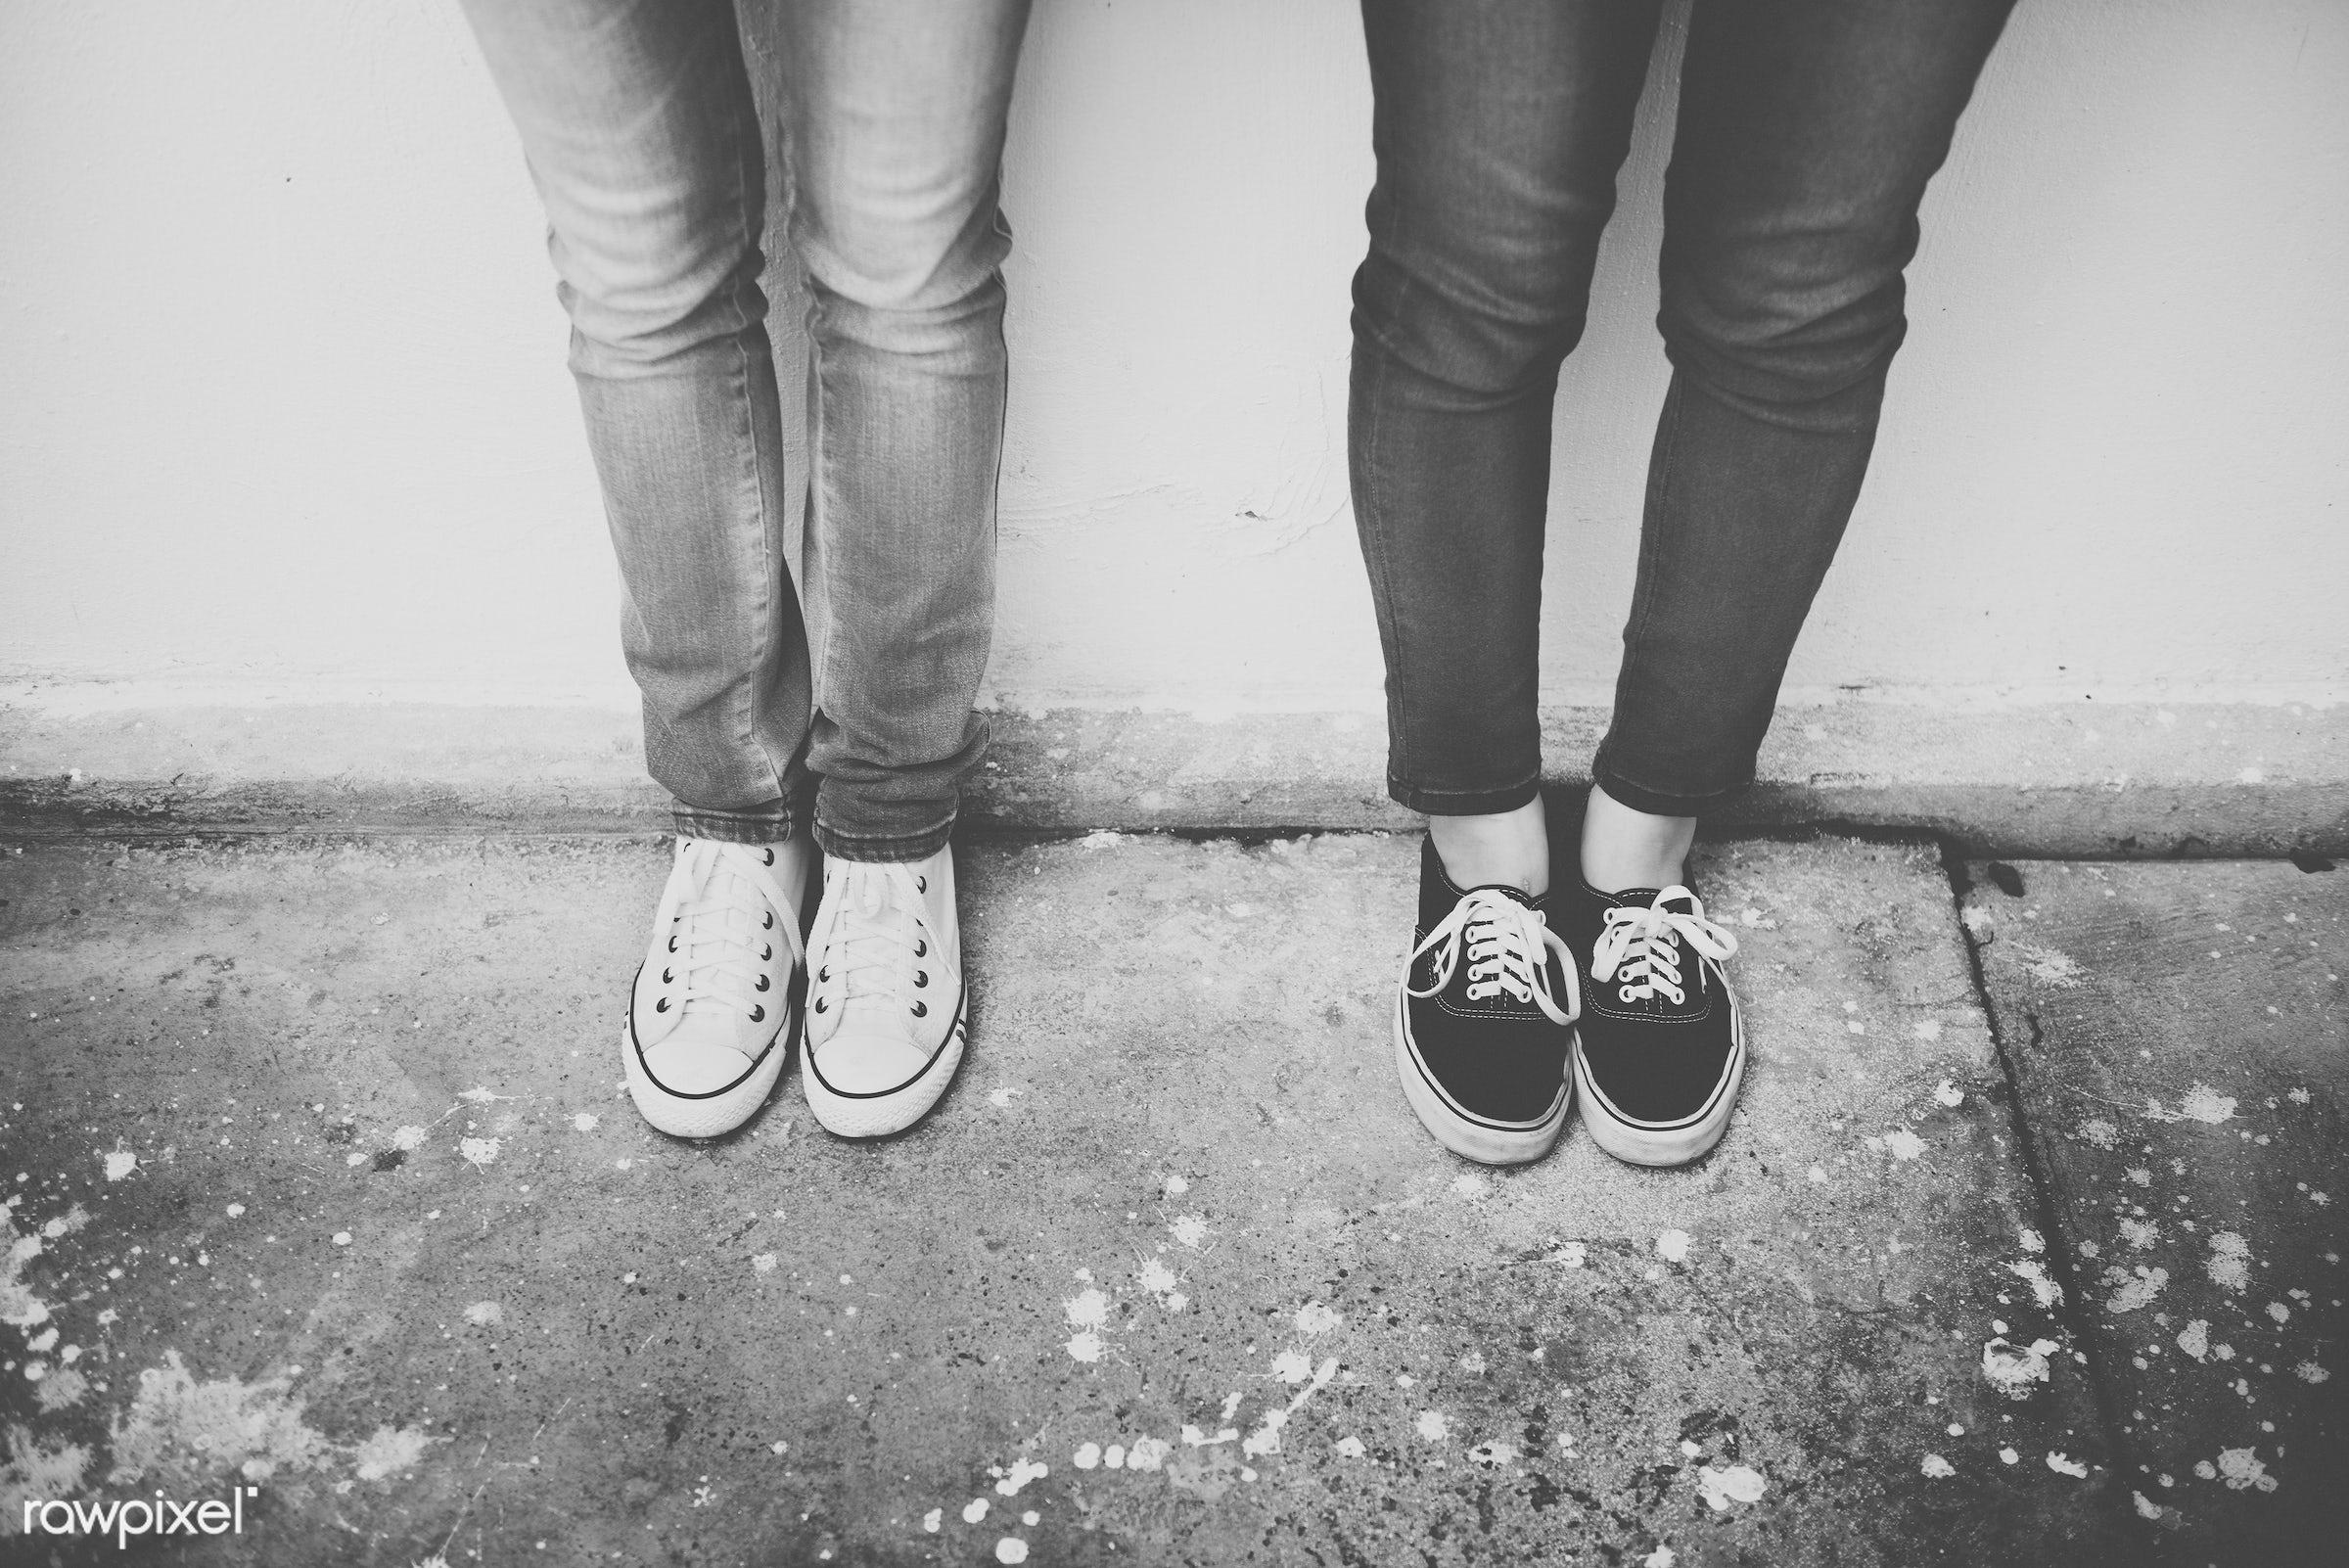 body, casual, city, city life, cool, fashionable, feet, female, foot, footpath, freedom, friends, friendship, human foot,...